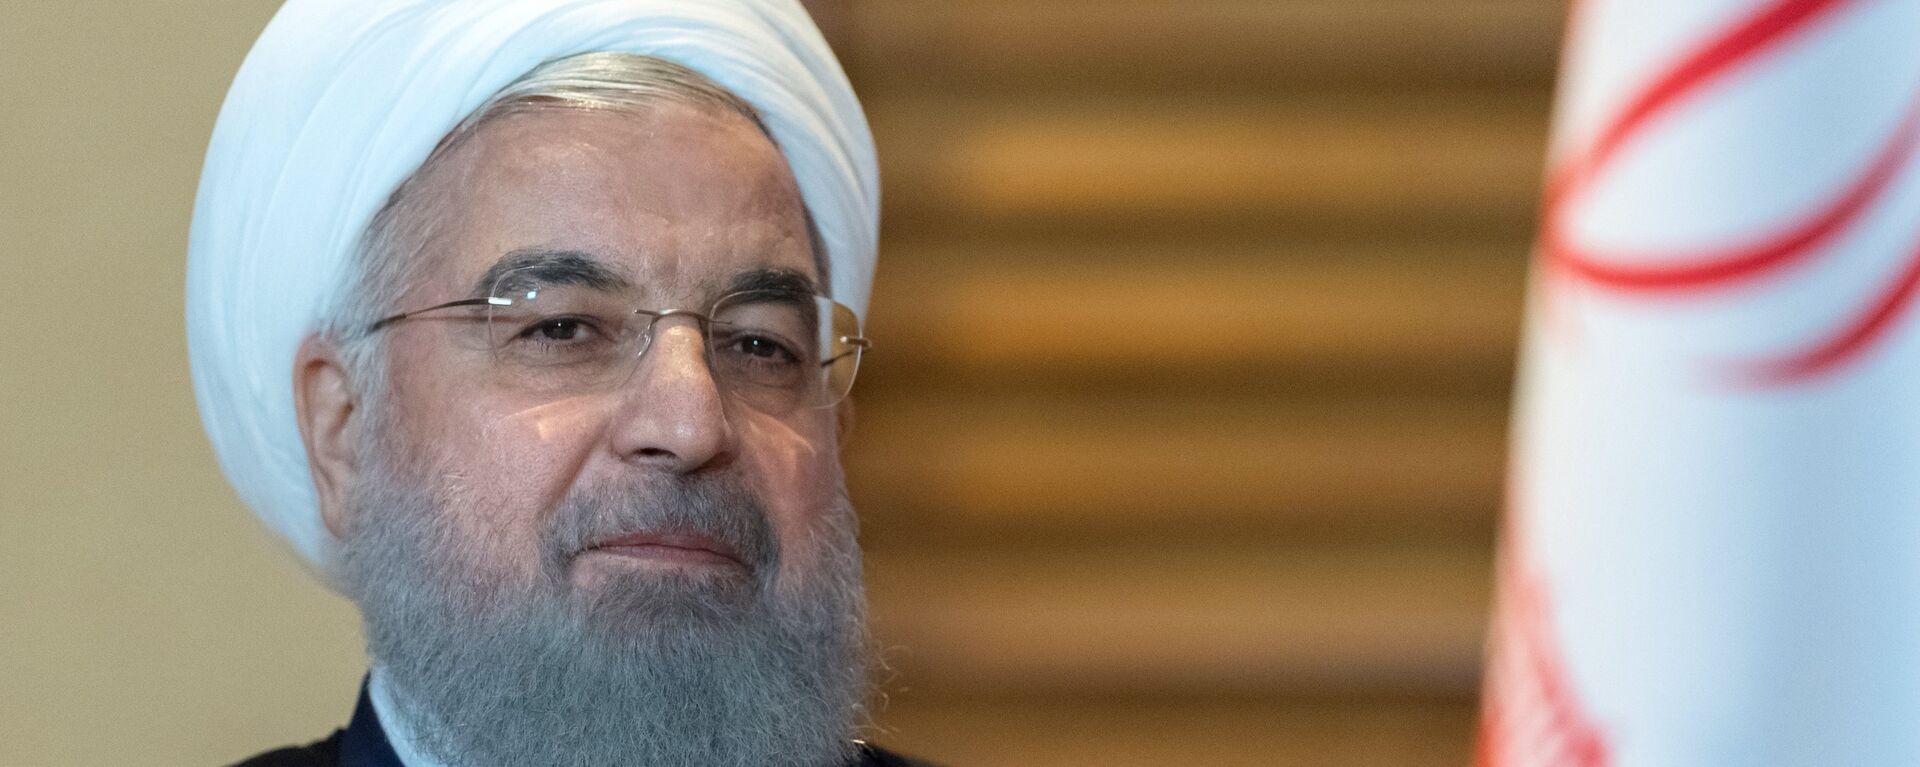 Hasán Rohaní, presidente de Irán - Sputnik Mundo, 1920, 15.04.2021